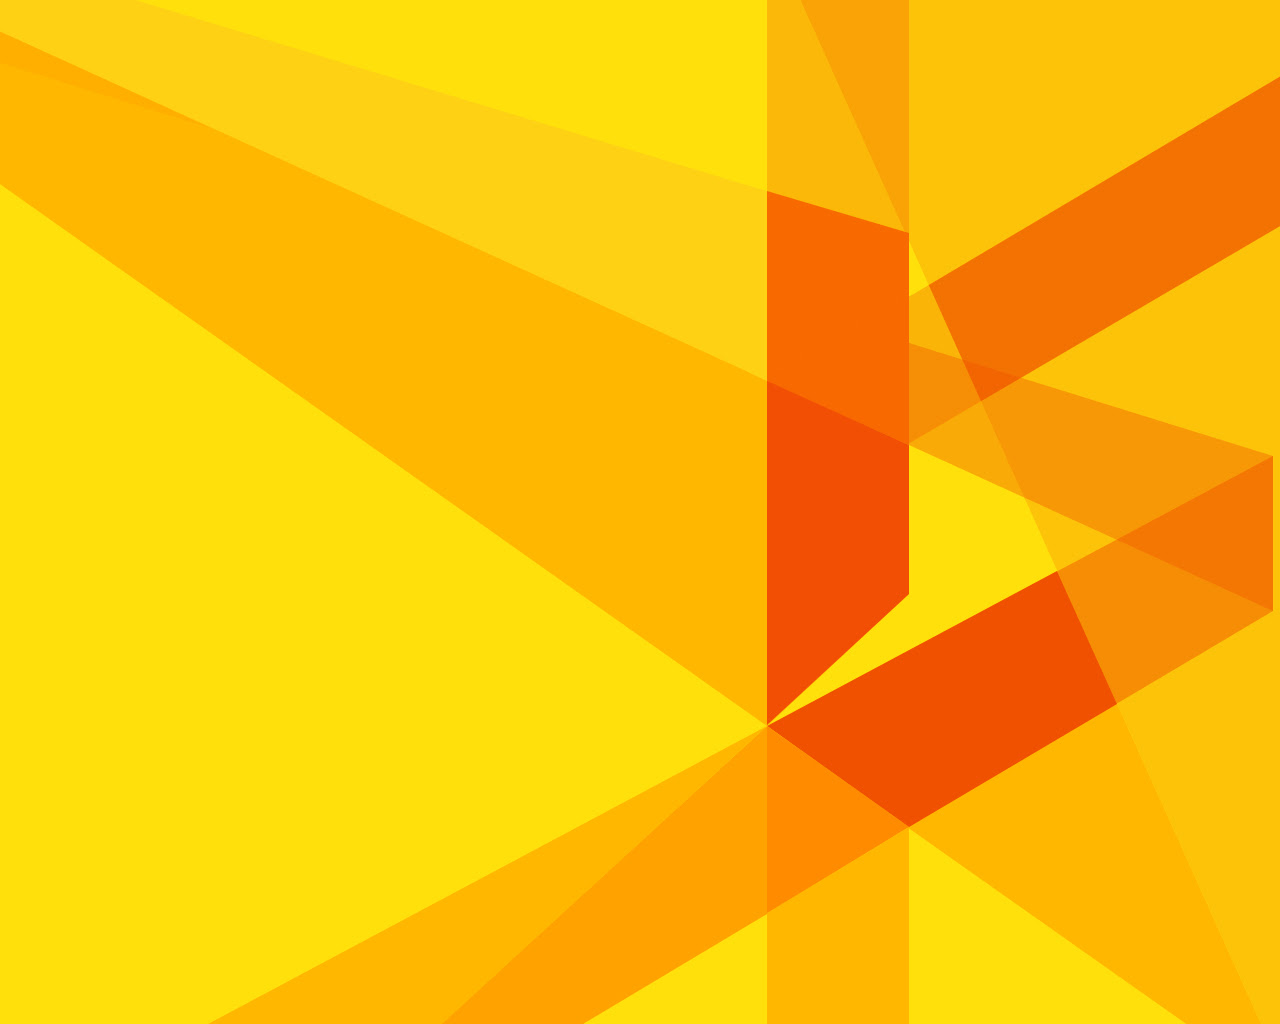 Background Warna Kuning Hd